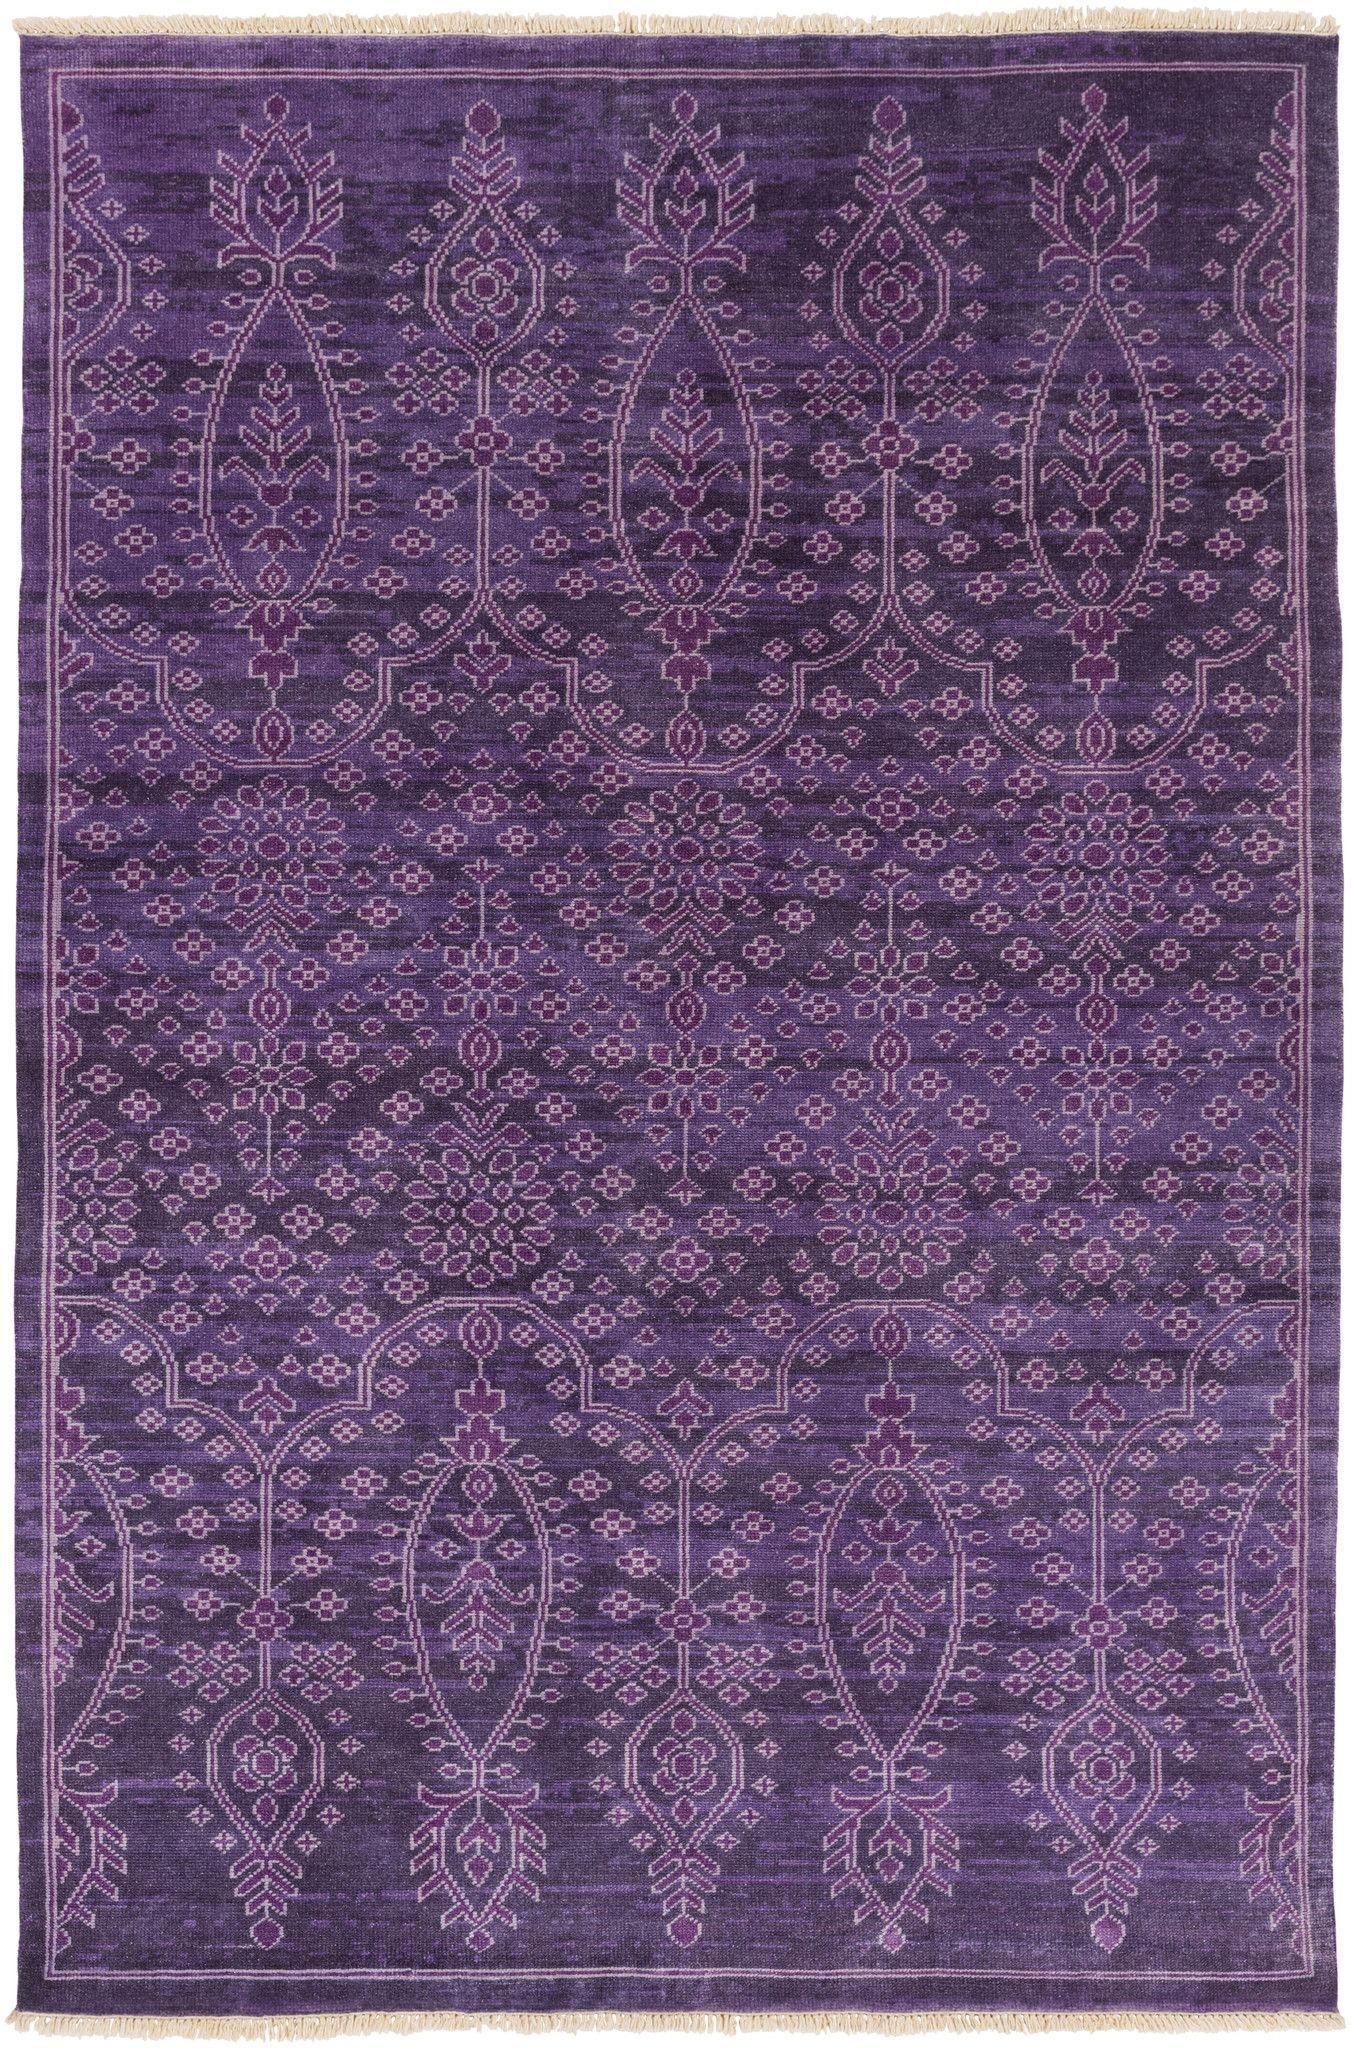 Antique Rug In Purple Design By Surya Purple Area Rugs Purple Rug Purple Carpet